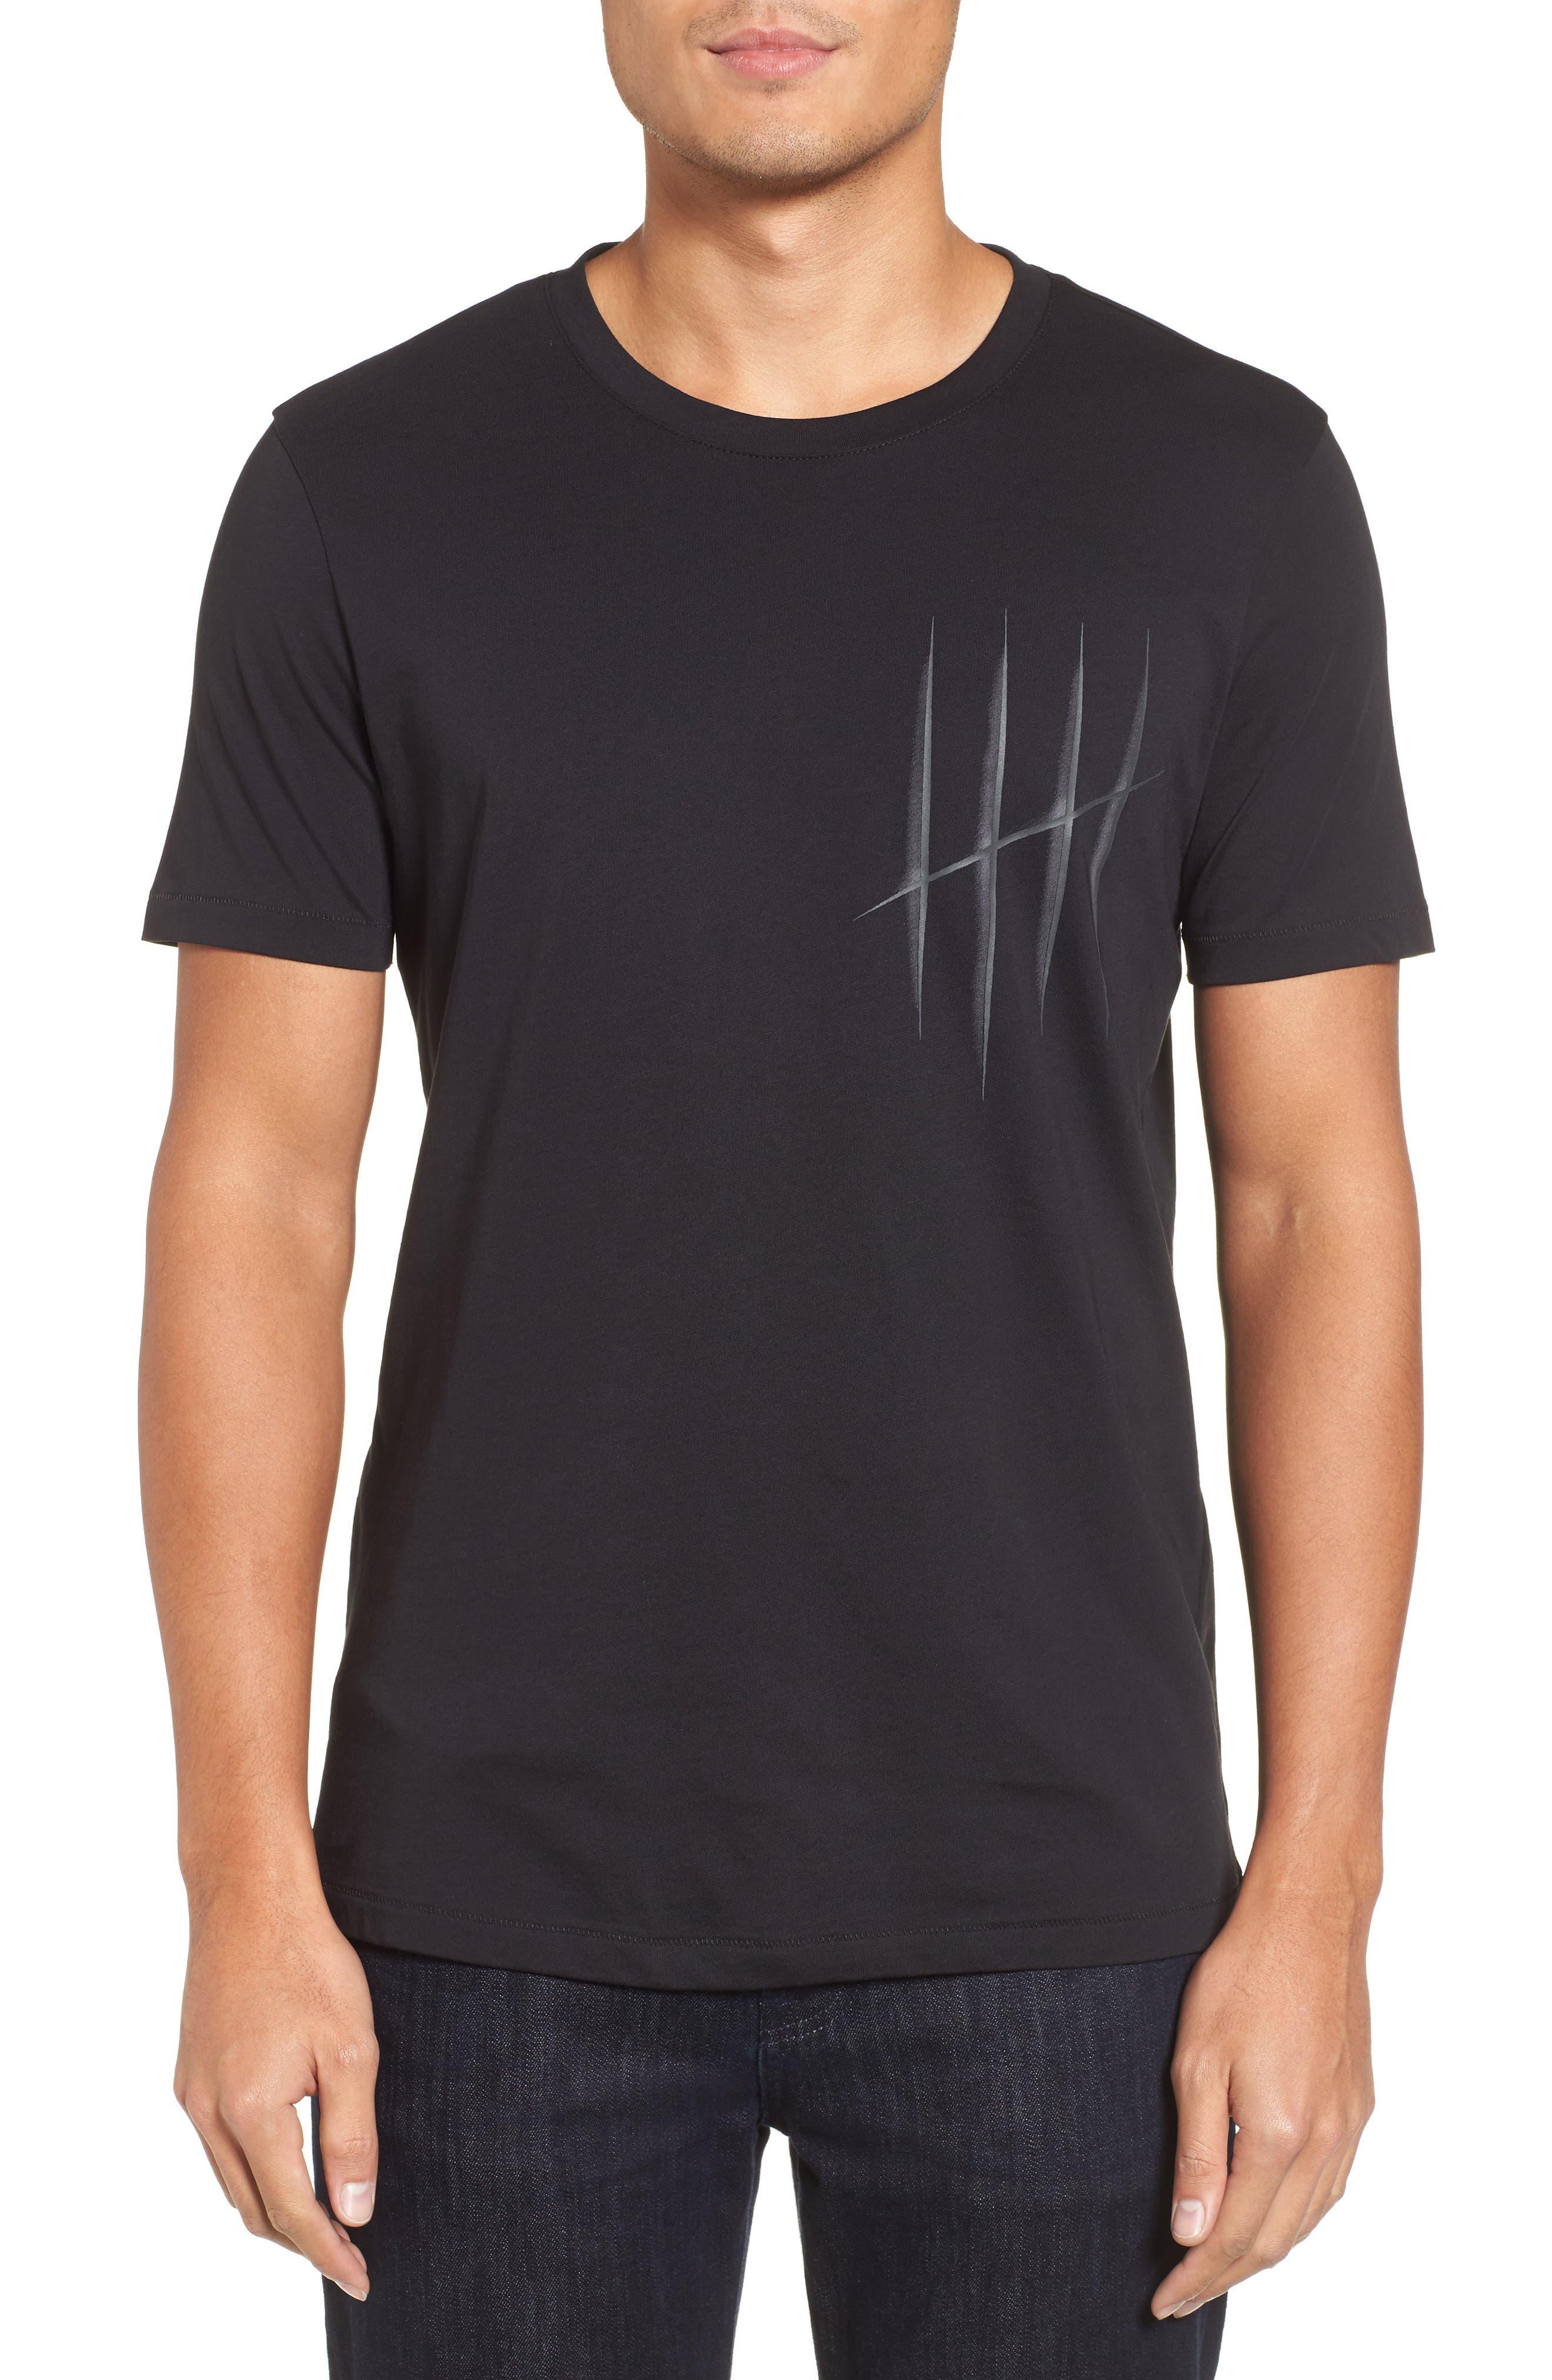 Hugo Boss Drison Hashmark Graphic T-Shirt,                         Main,                         color, 001